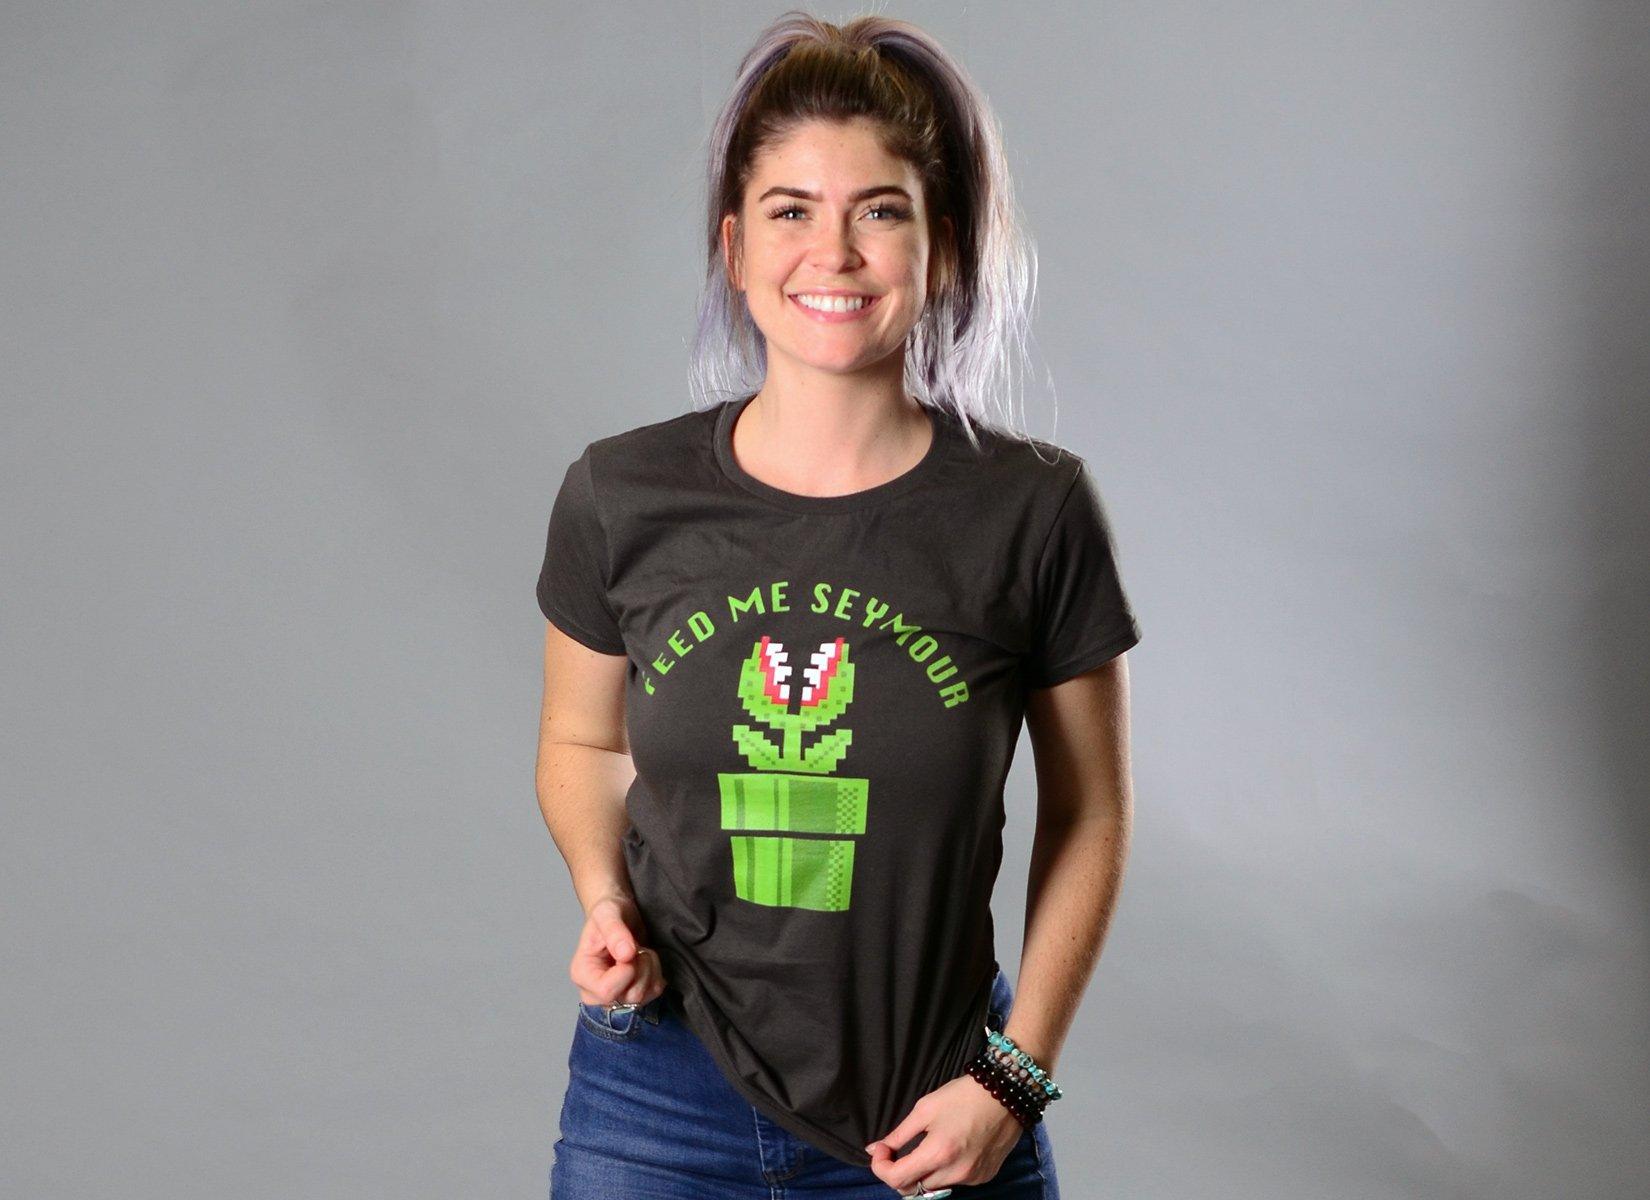 Feed Me Seymour on Womens T-Shirt